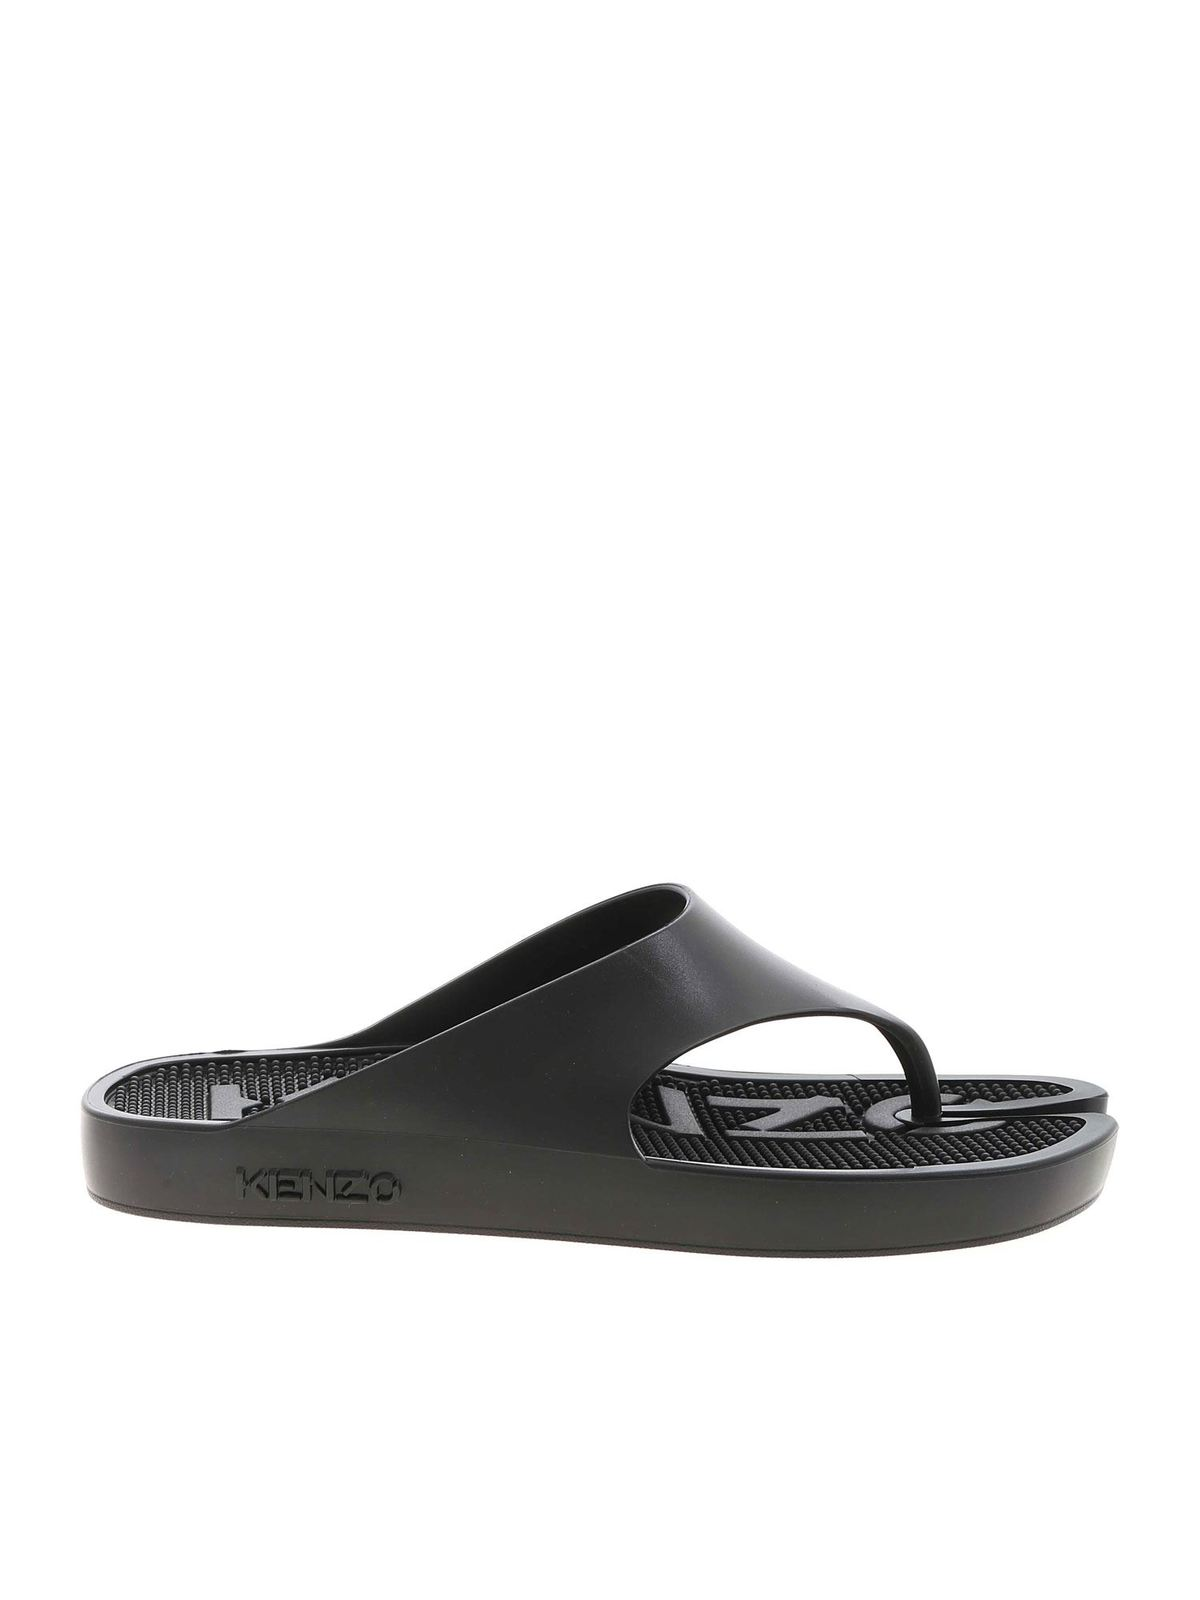 Kenzo FLIP-FLOPS SLIPPERS IN BLACK